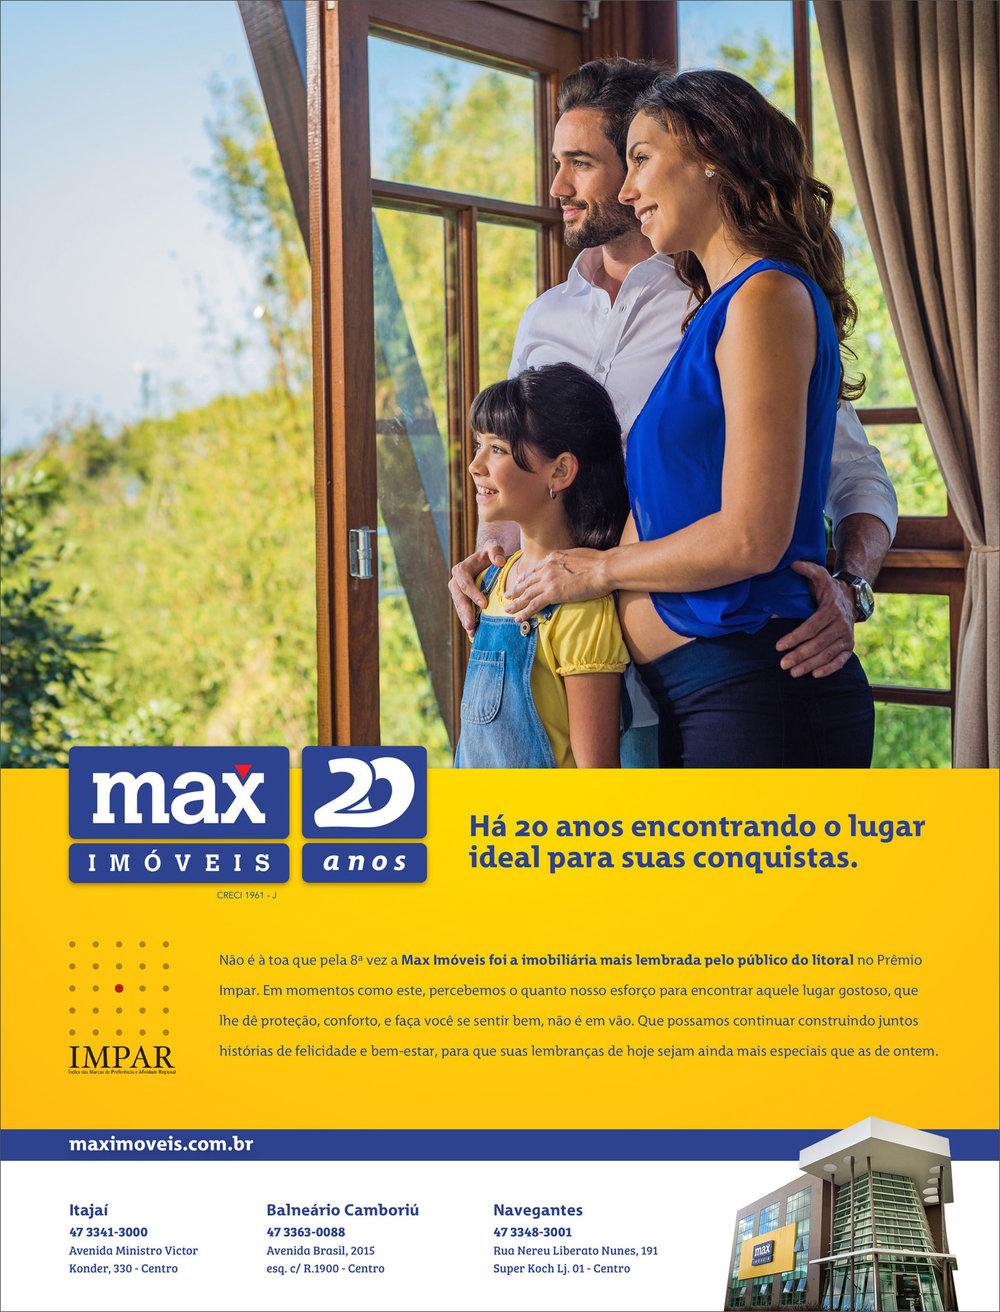 11521_MAX_Campanha_20_Anos_Anuncio-1PG_210x275mm.jpg